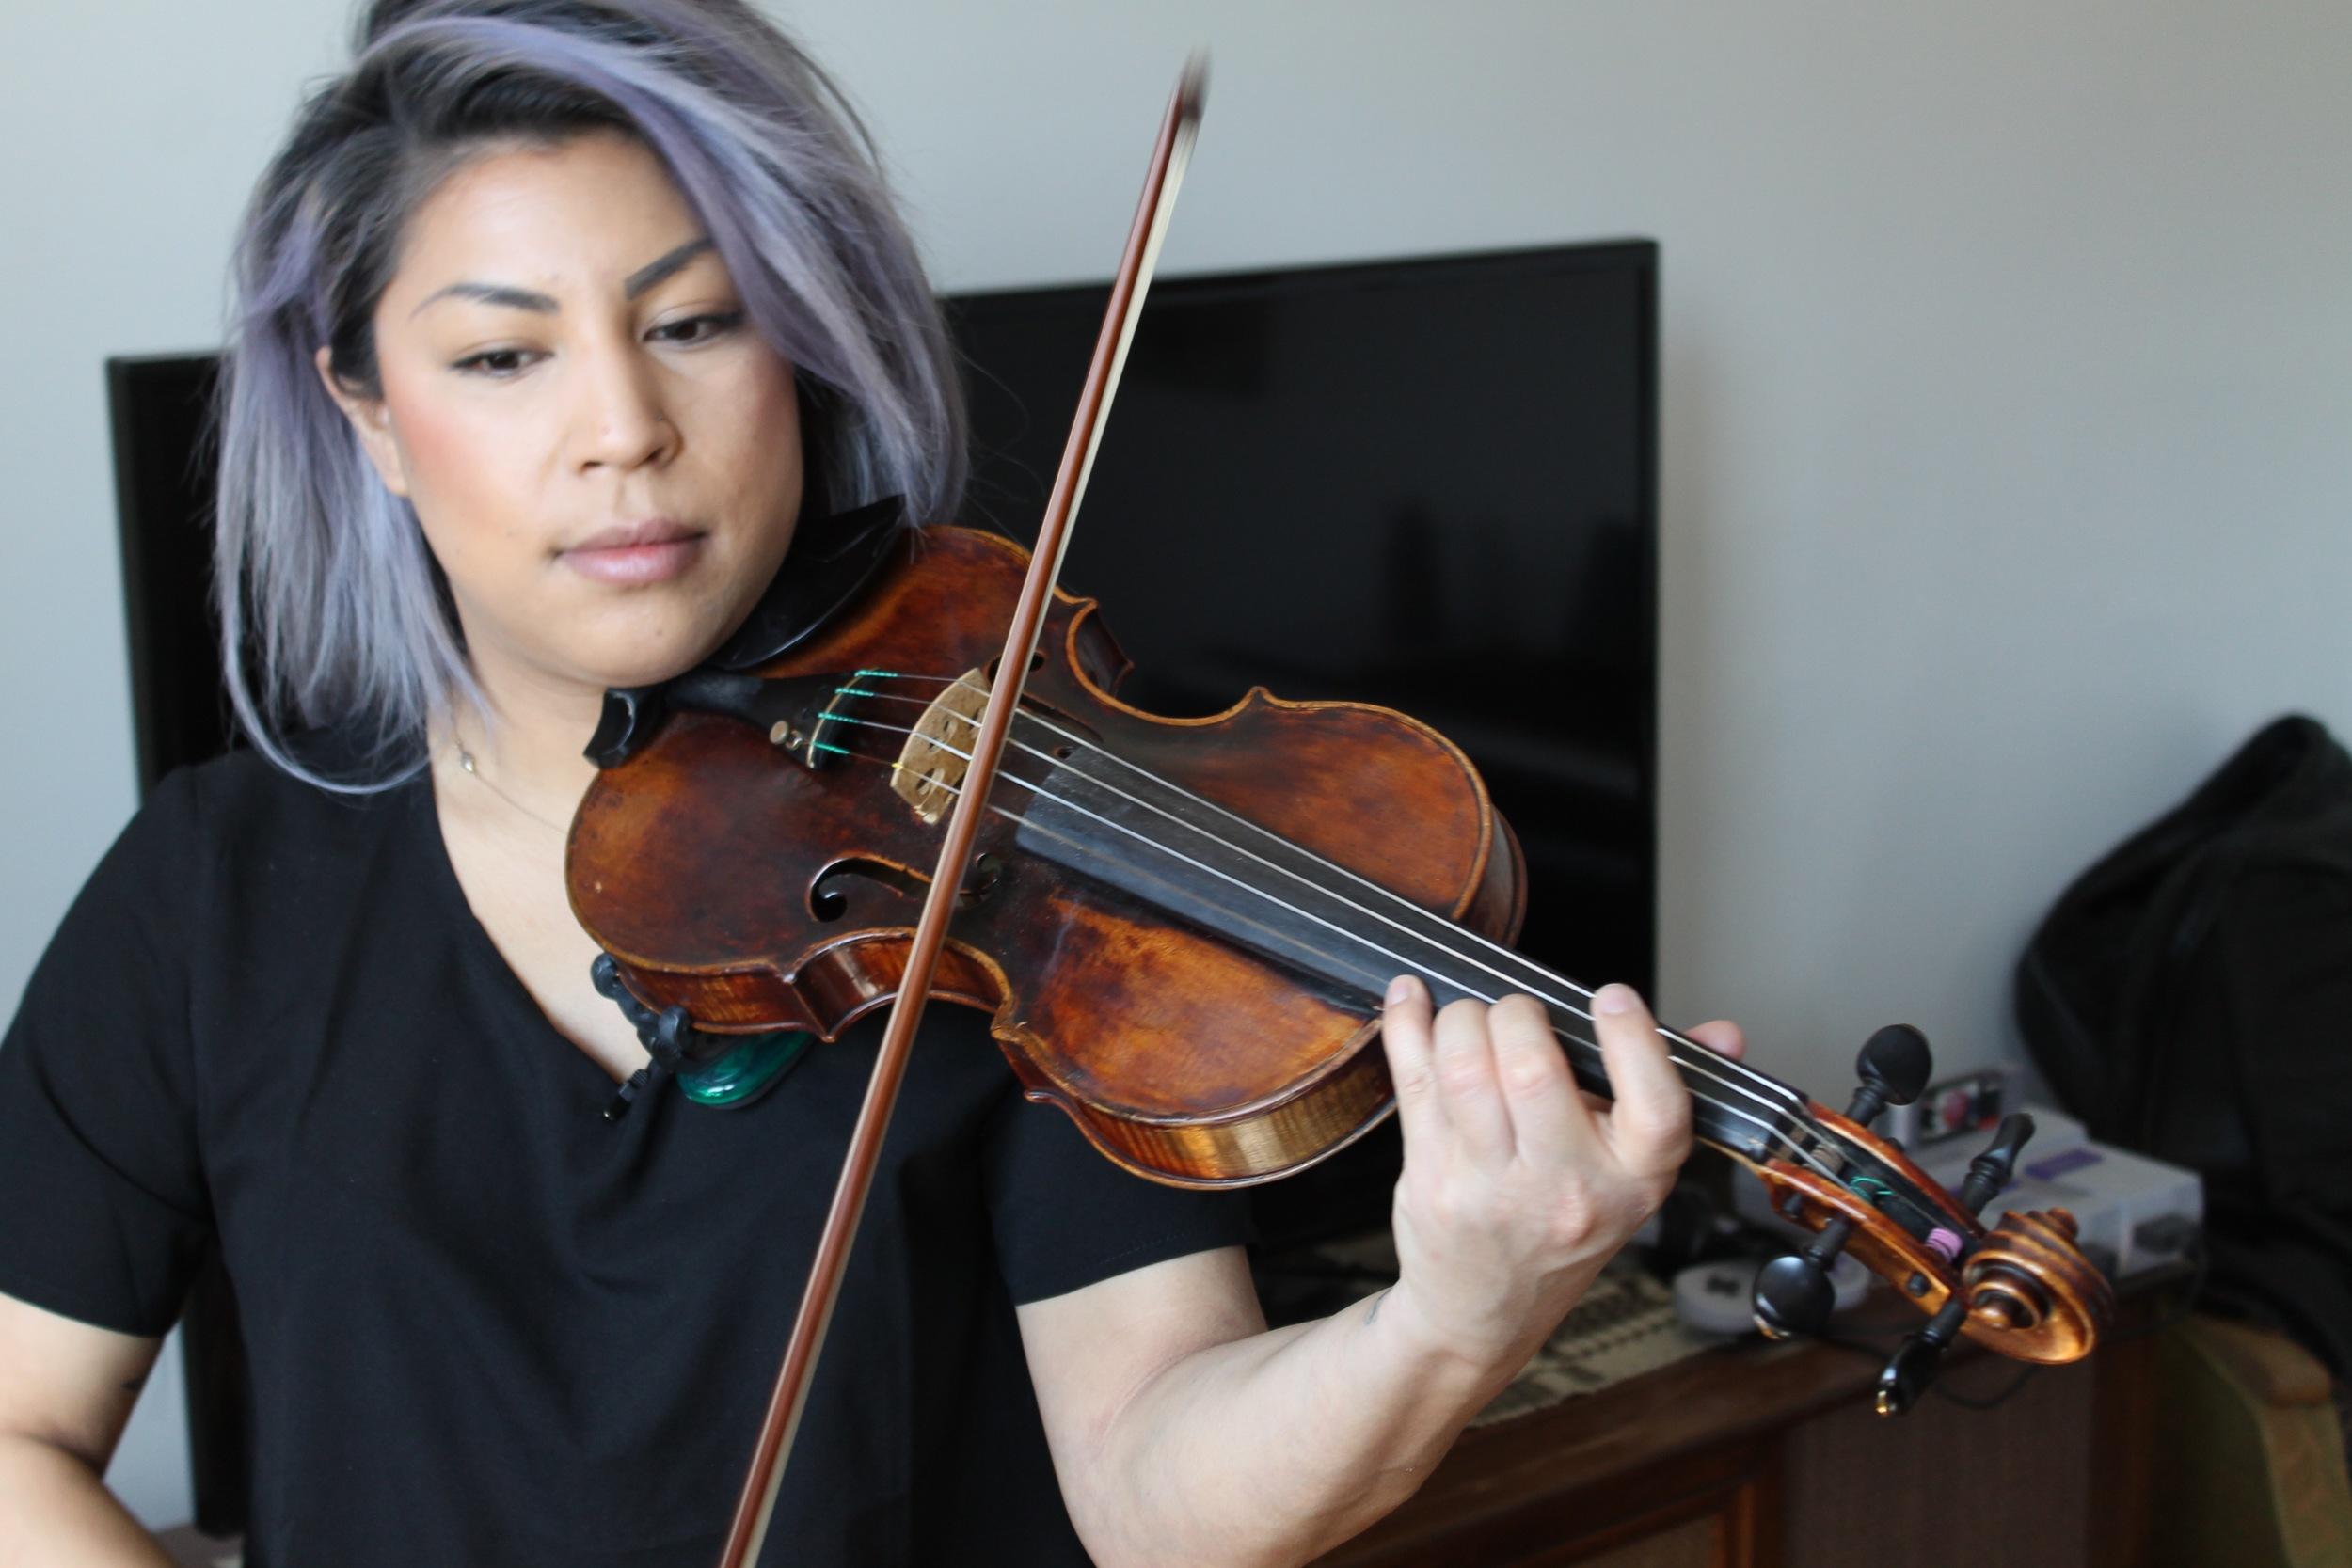 Singer, violinist and musician Maya Killtron - Apr. 2016